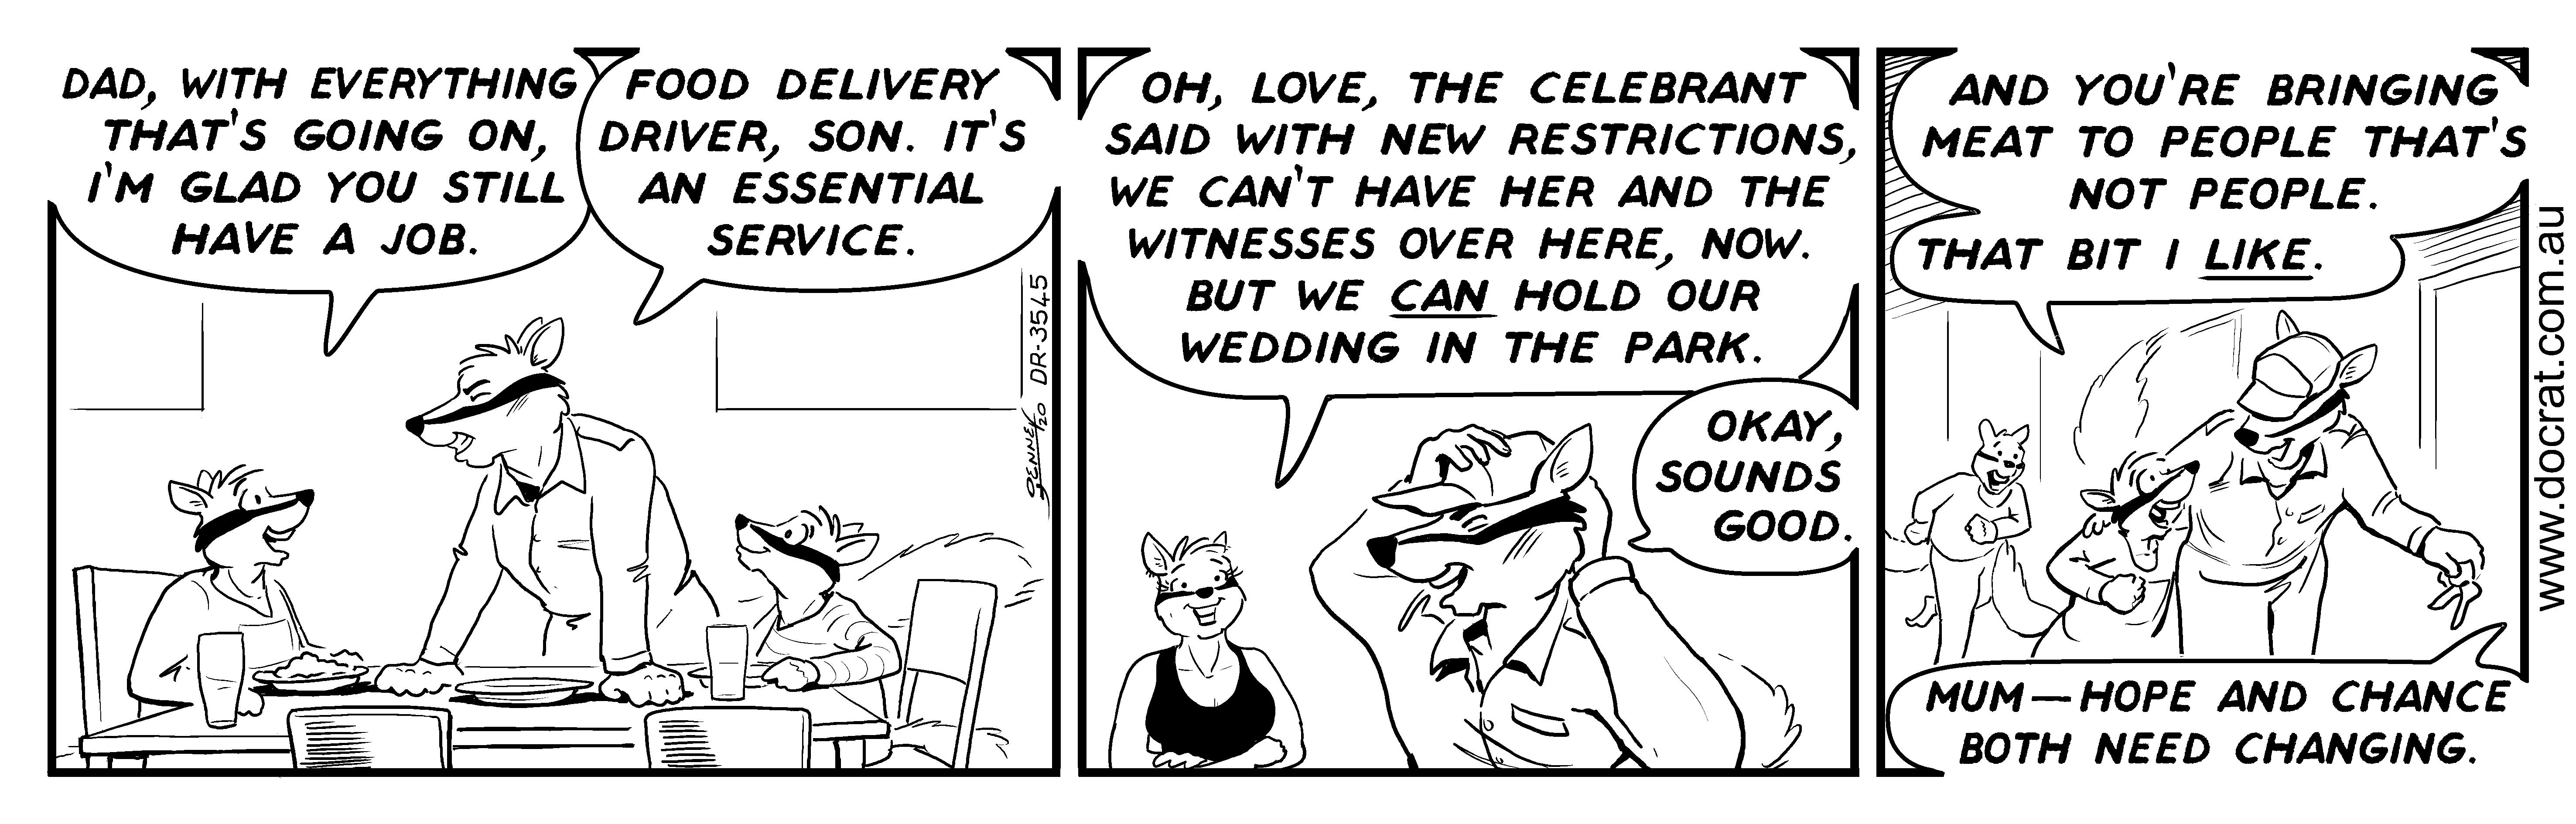 20200814